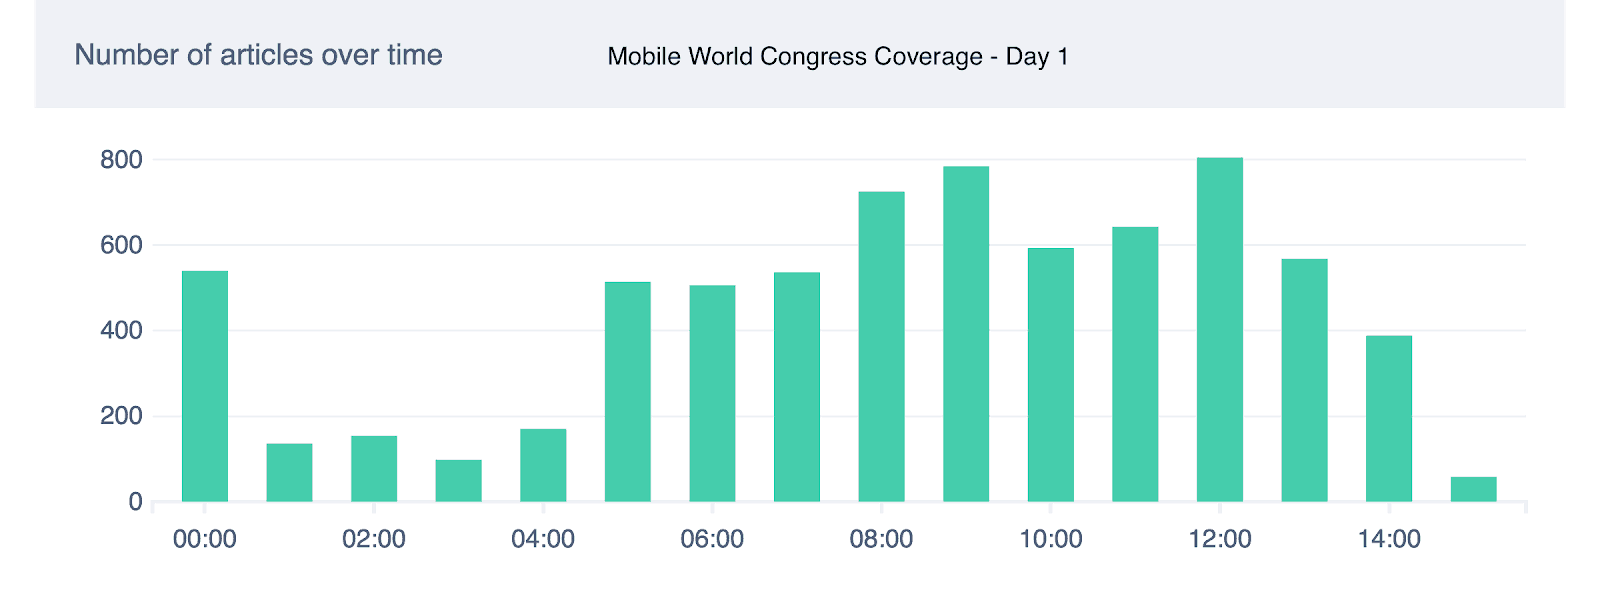 MWC19 media coverage